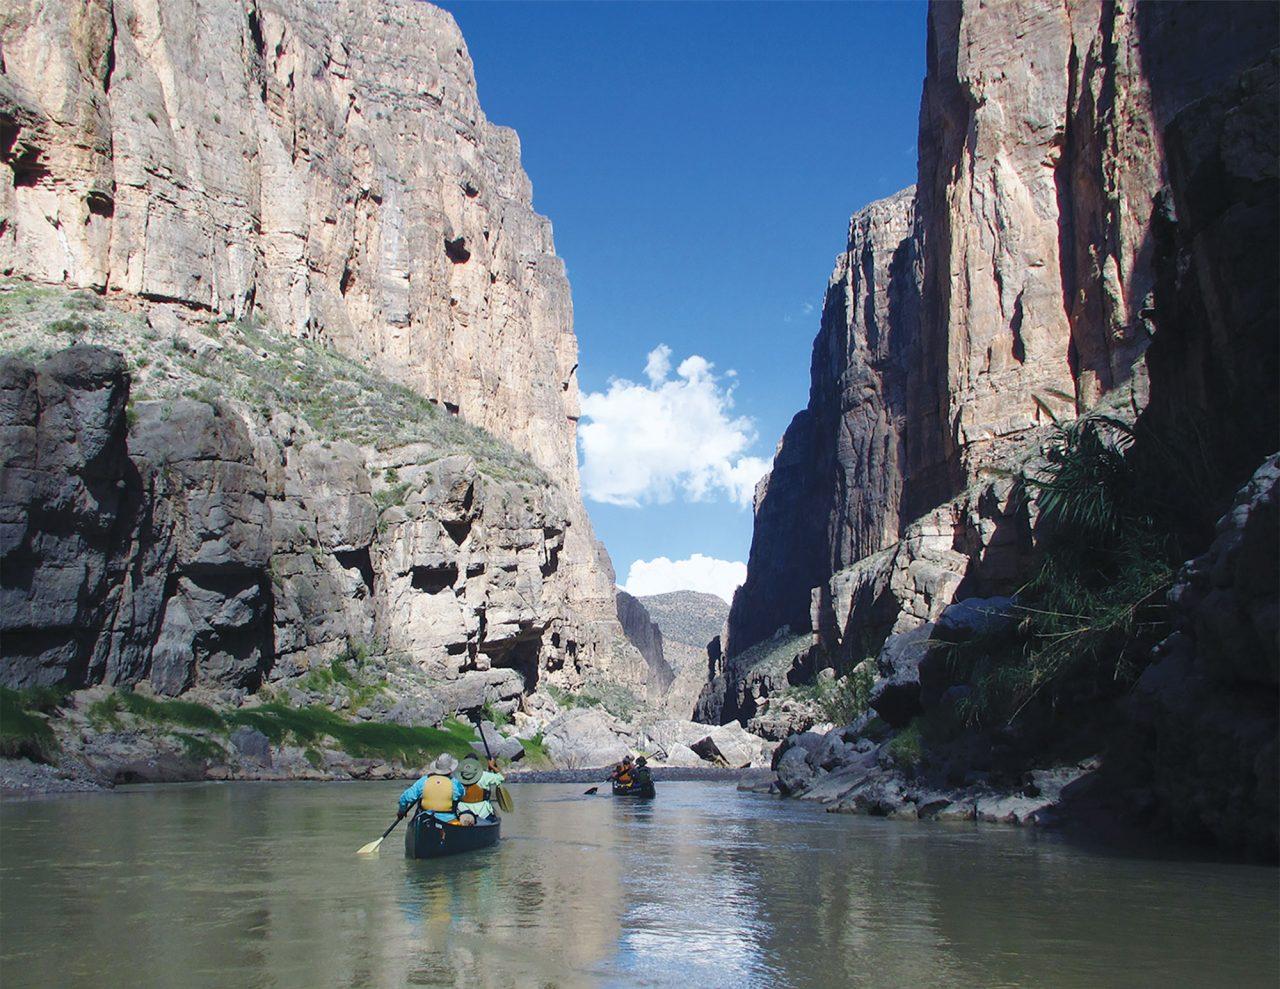 Canoeing Mariscal Canyon in Big Bend National Park; Photo courtesy NPS Photo/Jennette Jurado